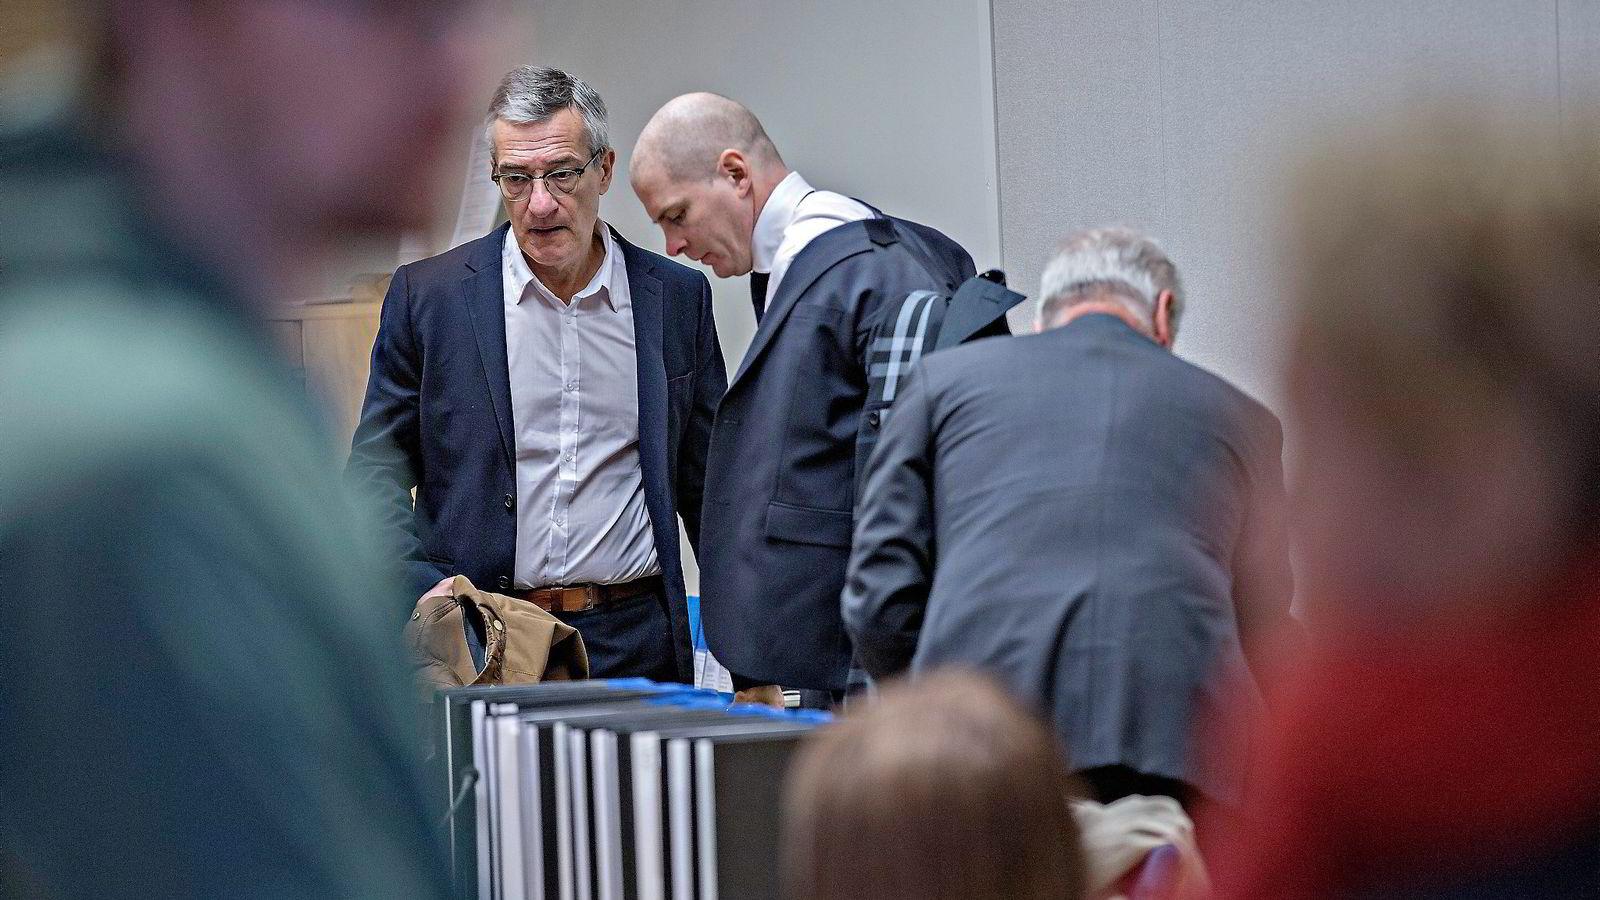 Boris Benulic (til venstre) og hans forsvarer Olle Kullinger i Södertörns Tingsrätt, der Benulic ble dømt til tre og et halvt års fengsel.               Foto: Aleksander Nordahl